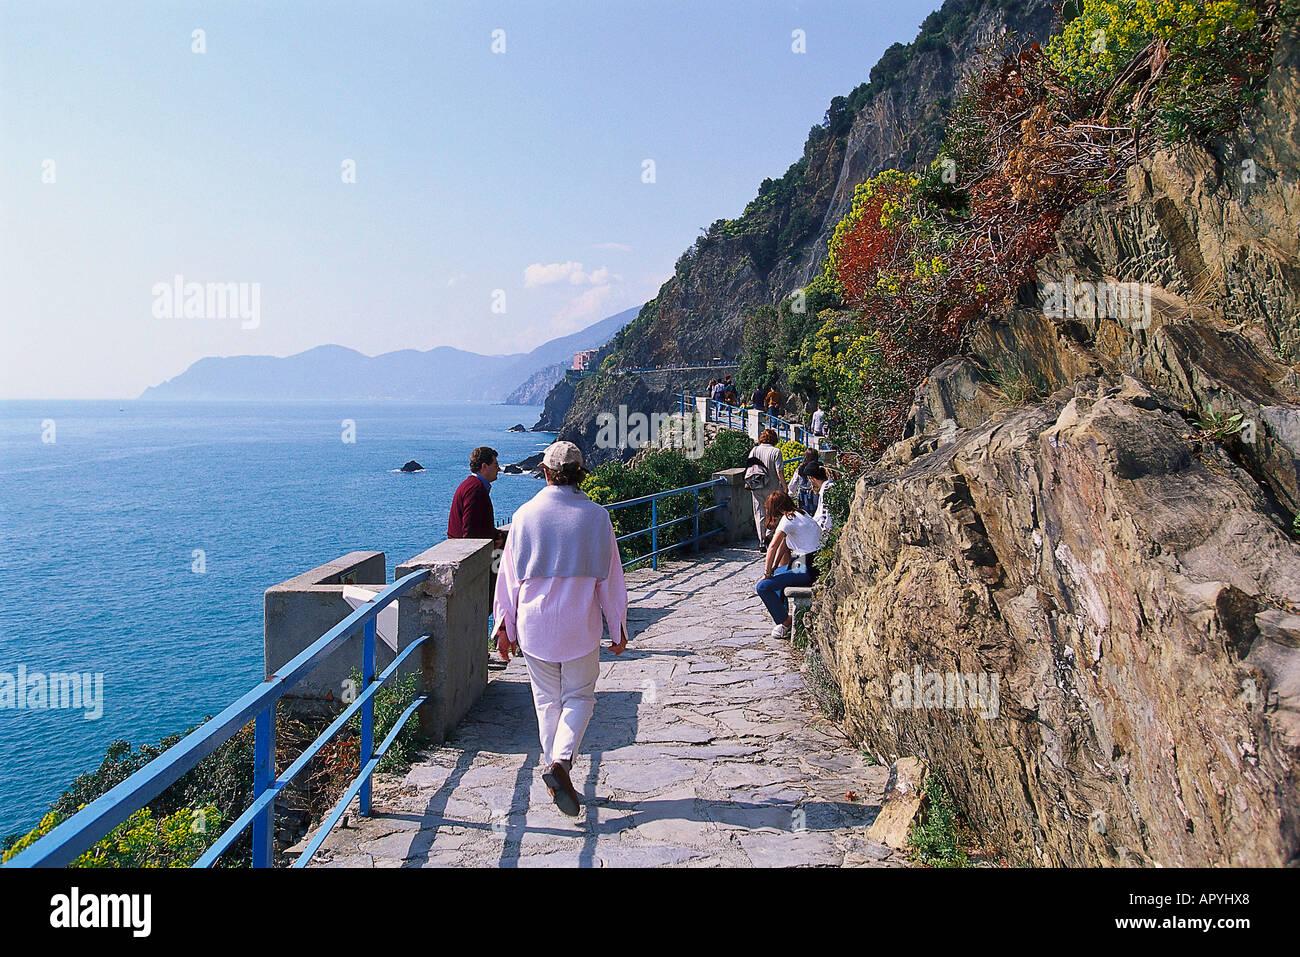 Via del Amore, Cinque Terre, Ligurien Italien - Stock Image